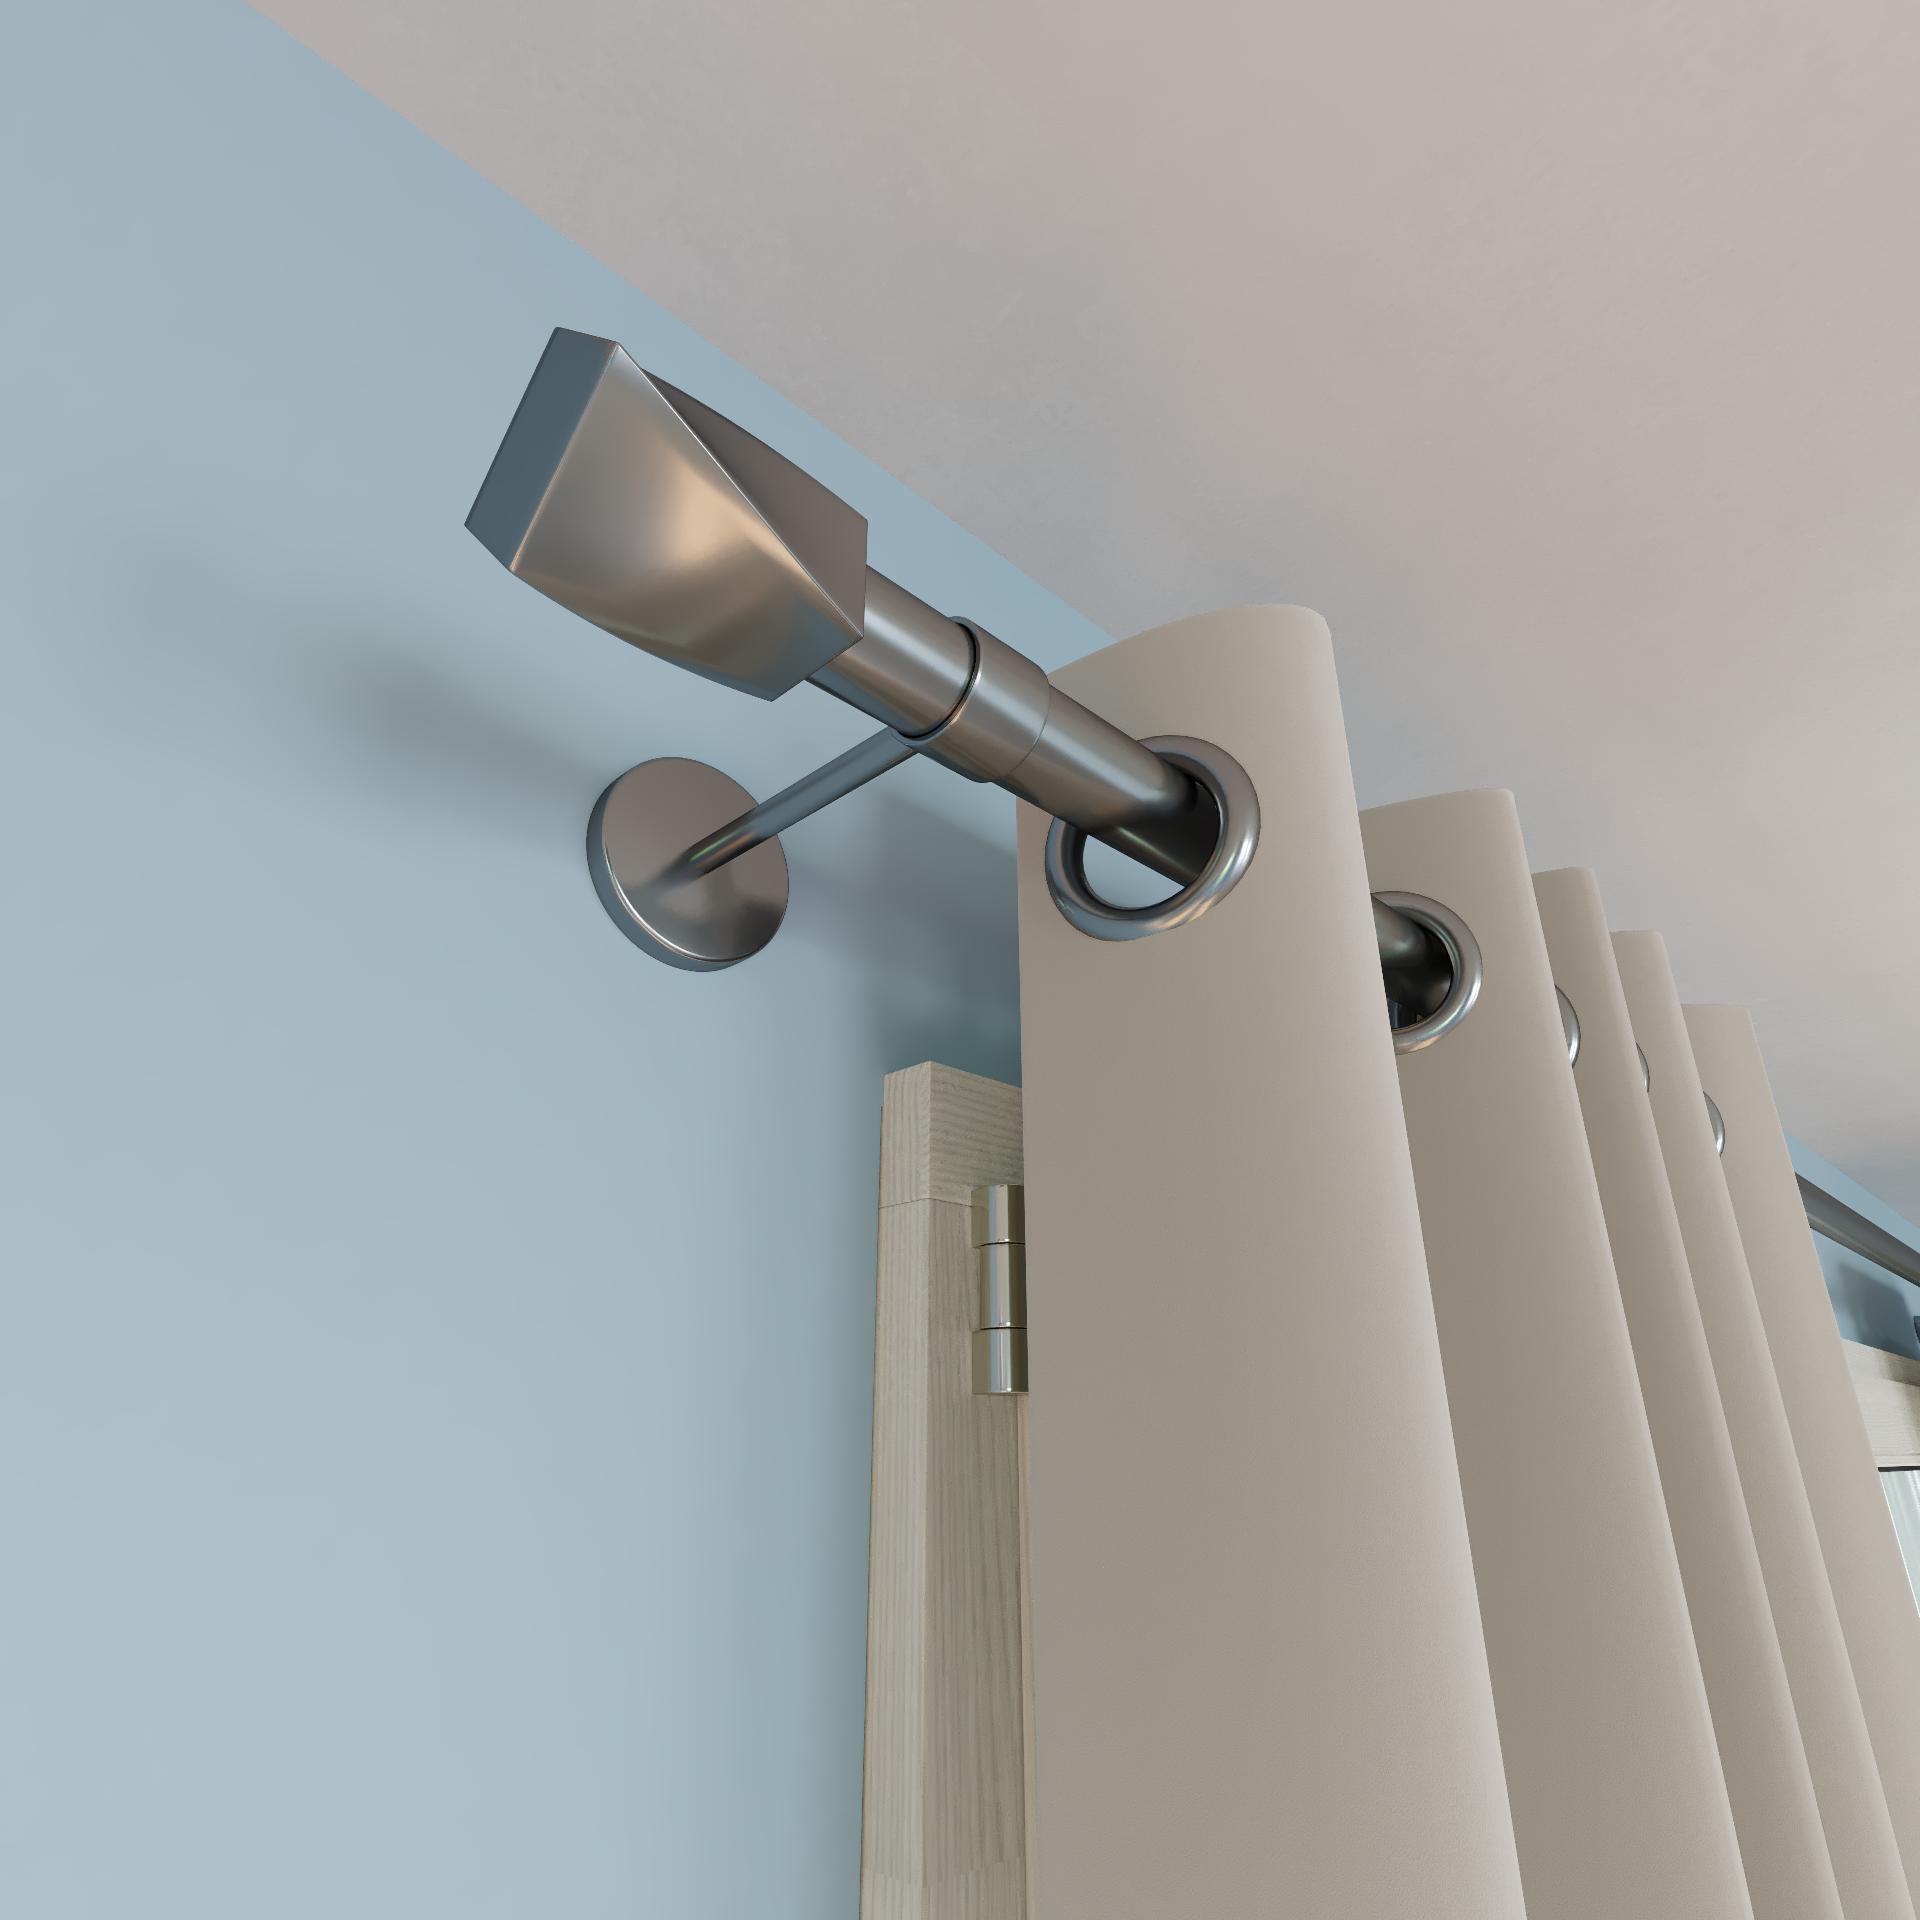 lot de 2 supports sans percage murs perces tringle a rideau 28 mm gris mat ib